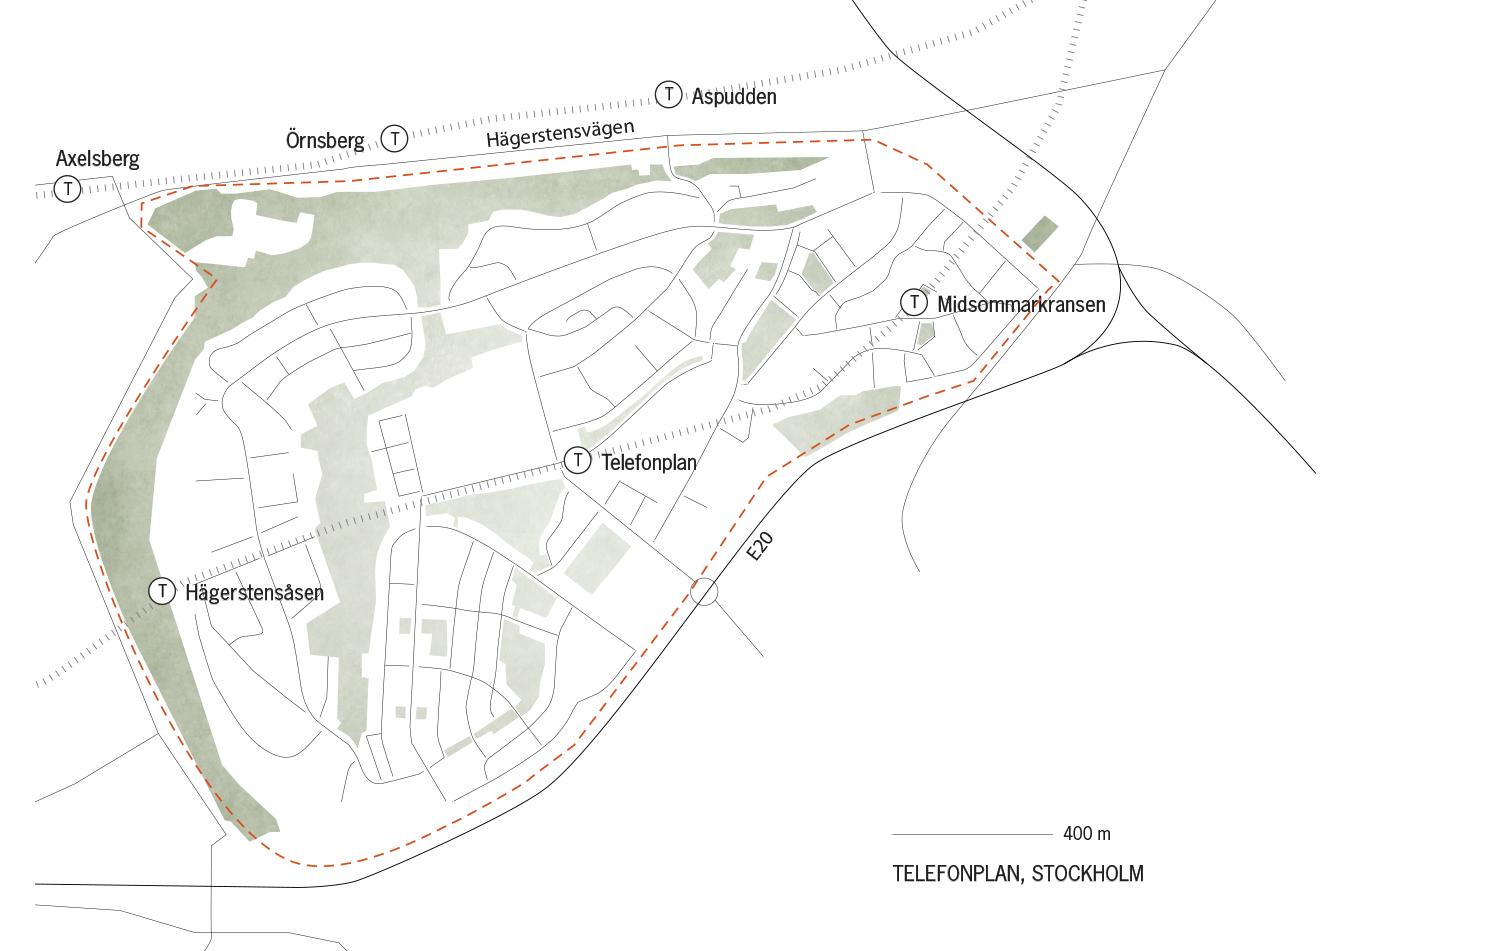 Telefonplan_iconkarta_LAnd_Arkitektur_2017